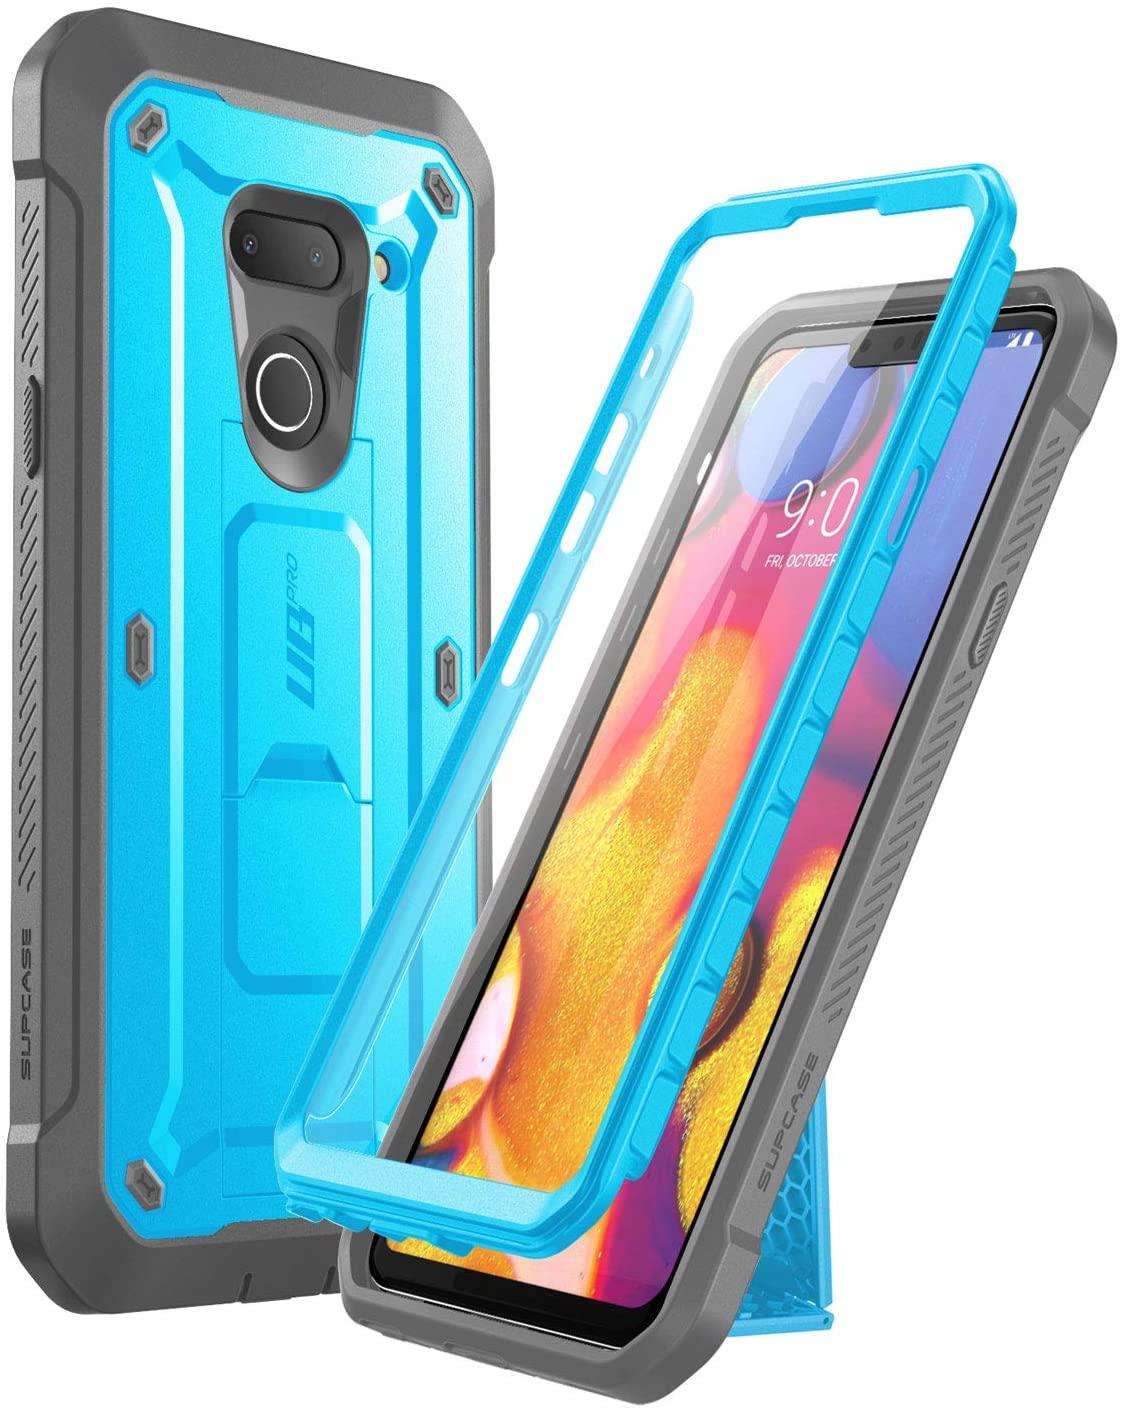 SUPCASE UBPro系列適用於LG G8/LG G8 ThinQ手機殼2019年堅固的堅固保護殼內置屏幕保護膜